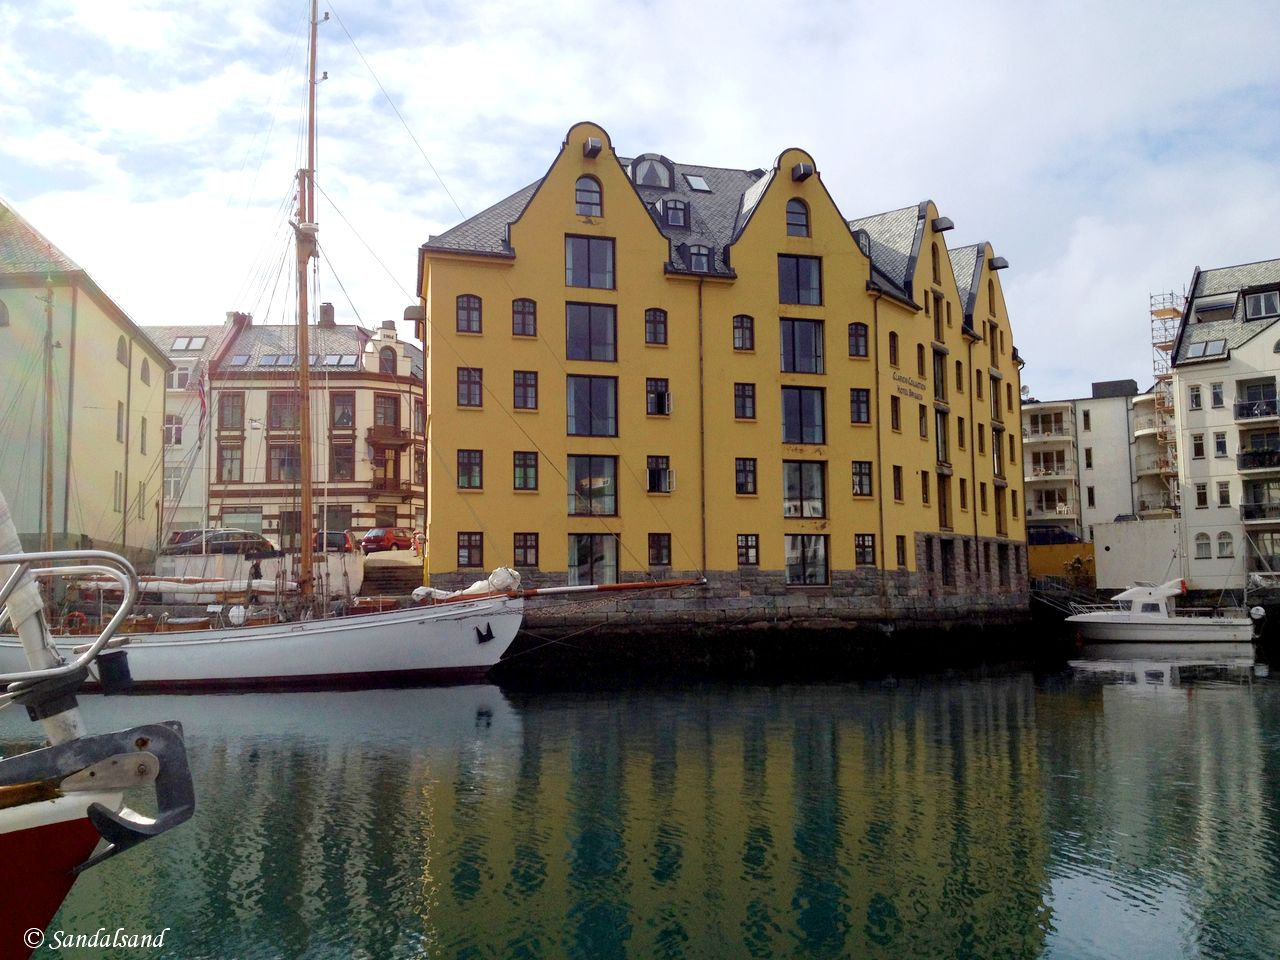 Norway - More og Romsdal - Aalesund